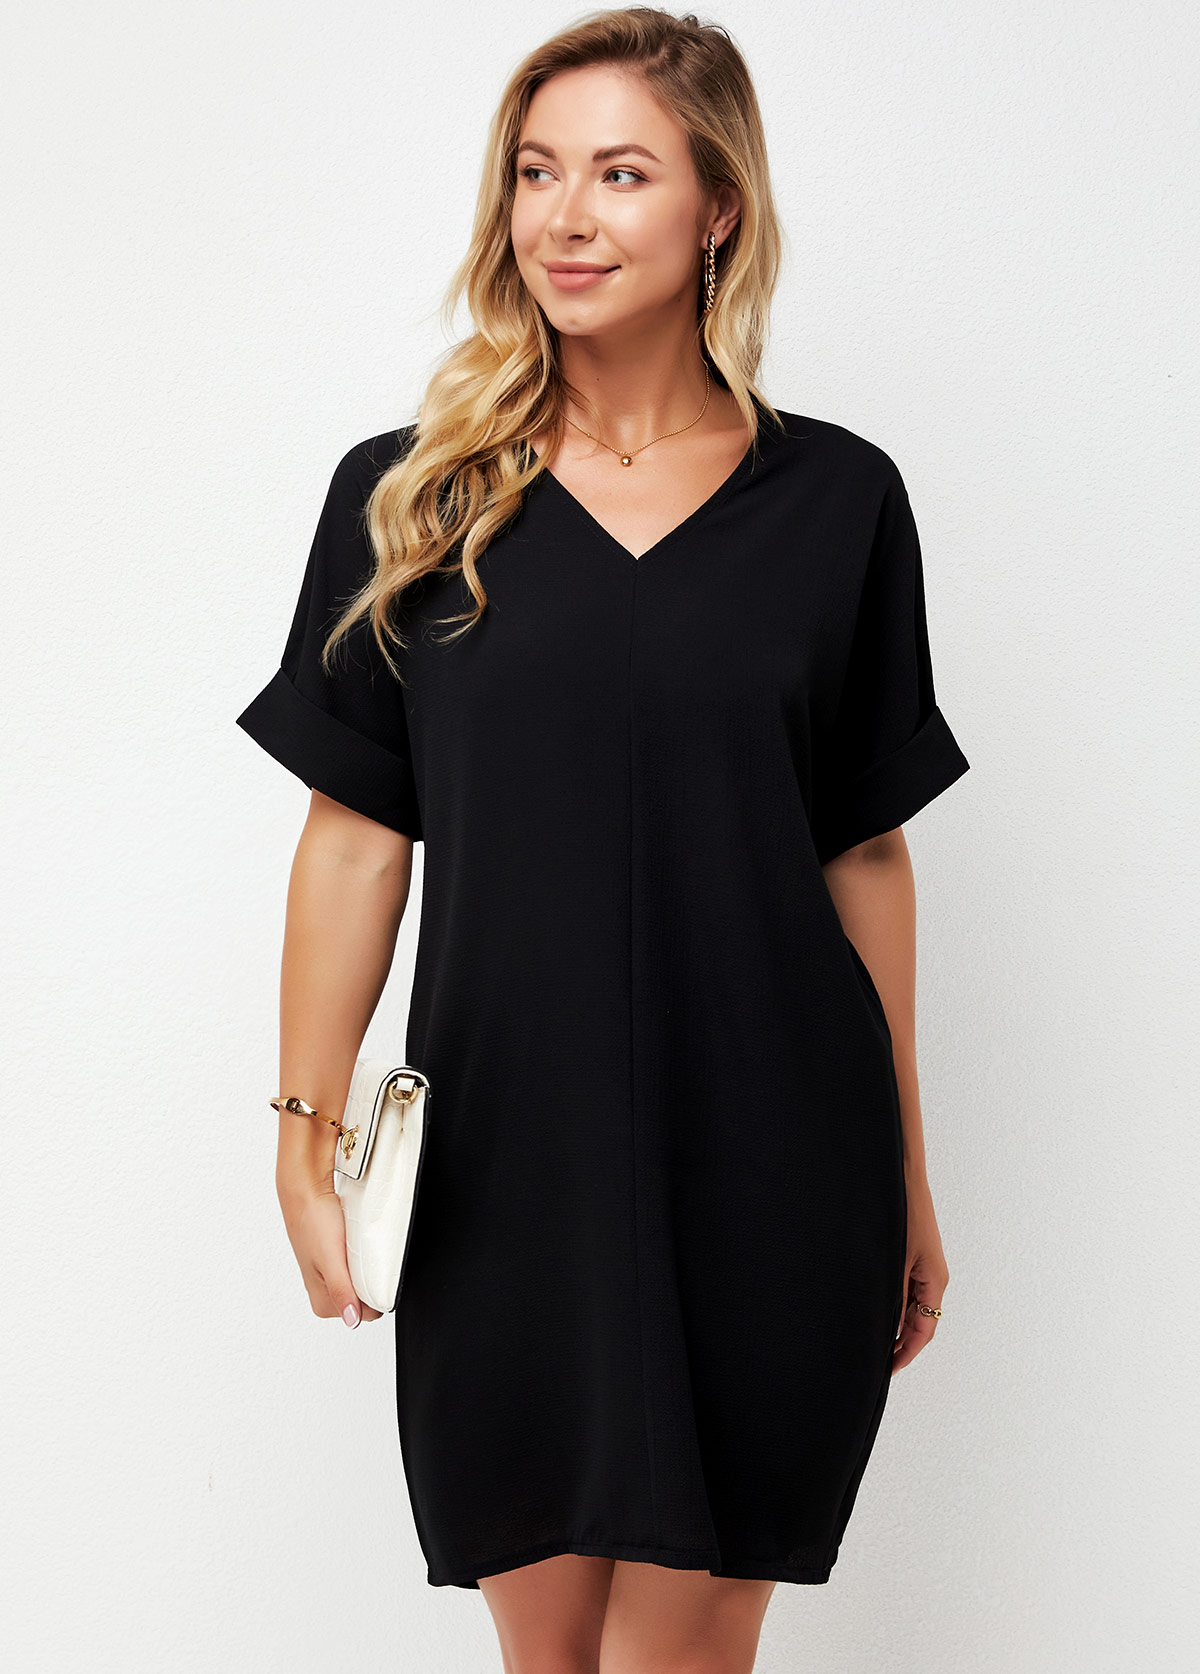 V Neck Short Sleeve Black Dress